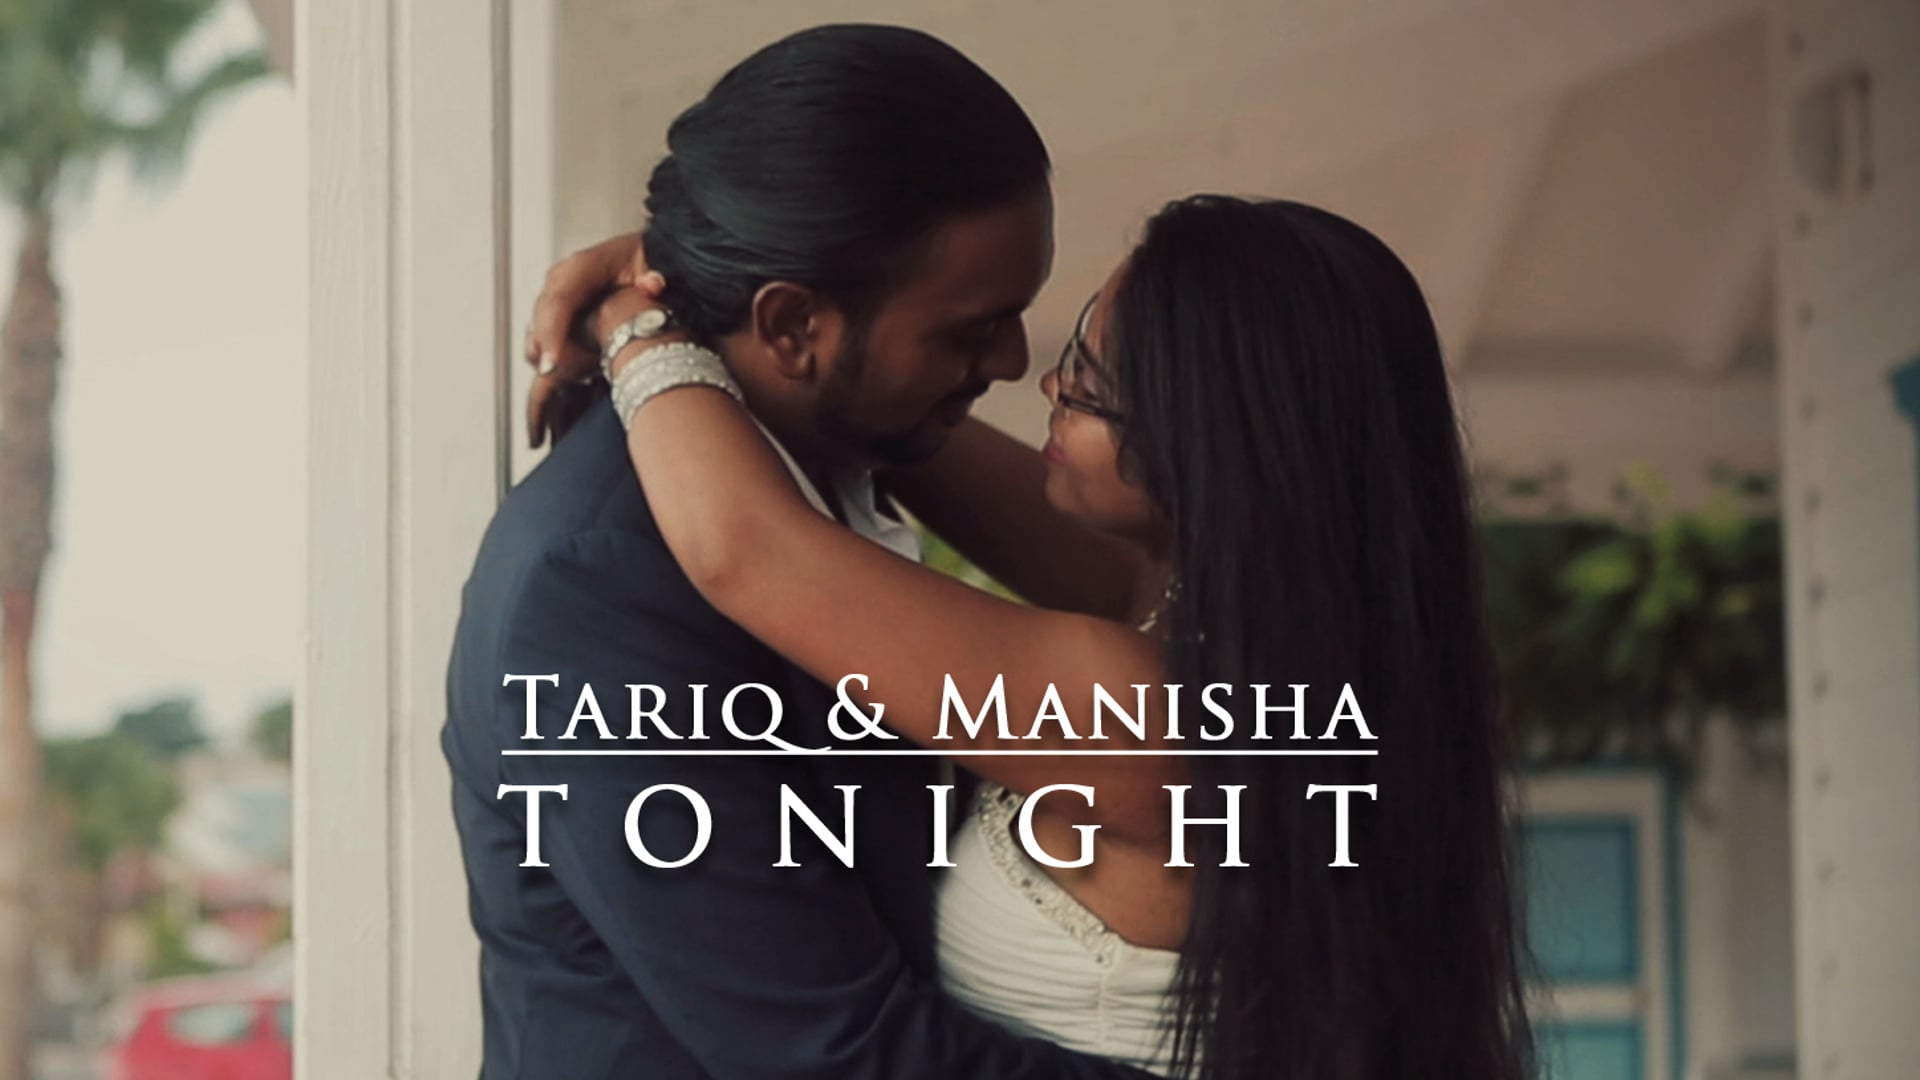 Tariq & Manisha ⦅ T O N I G H T ⦆ Marrone Wedding Film in St-Maarten